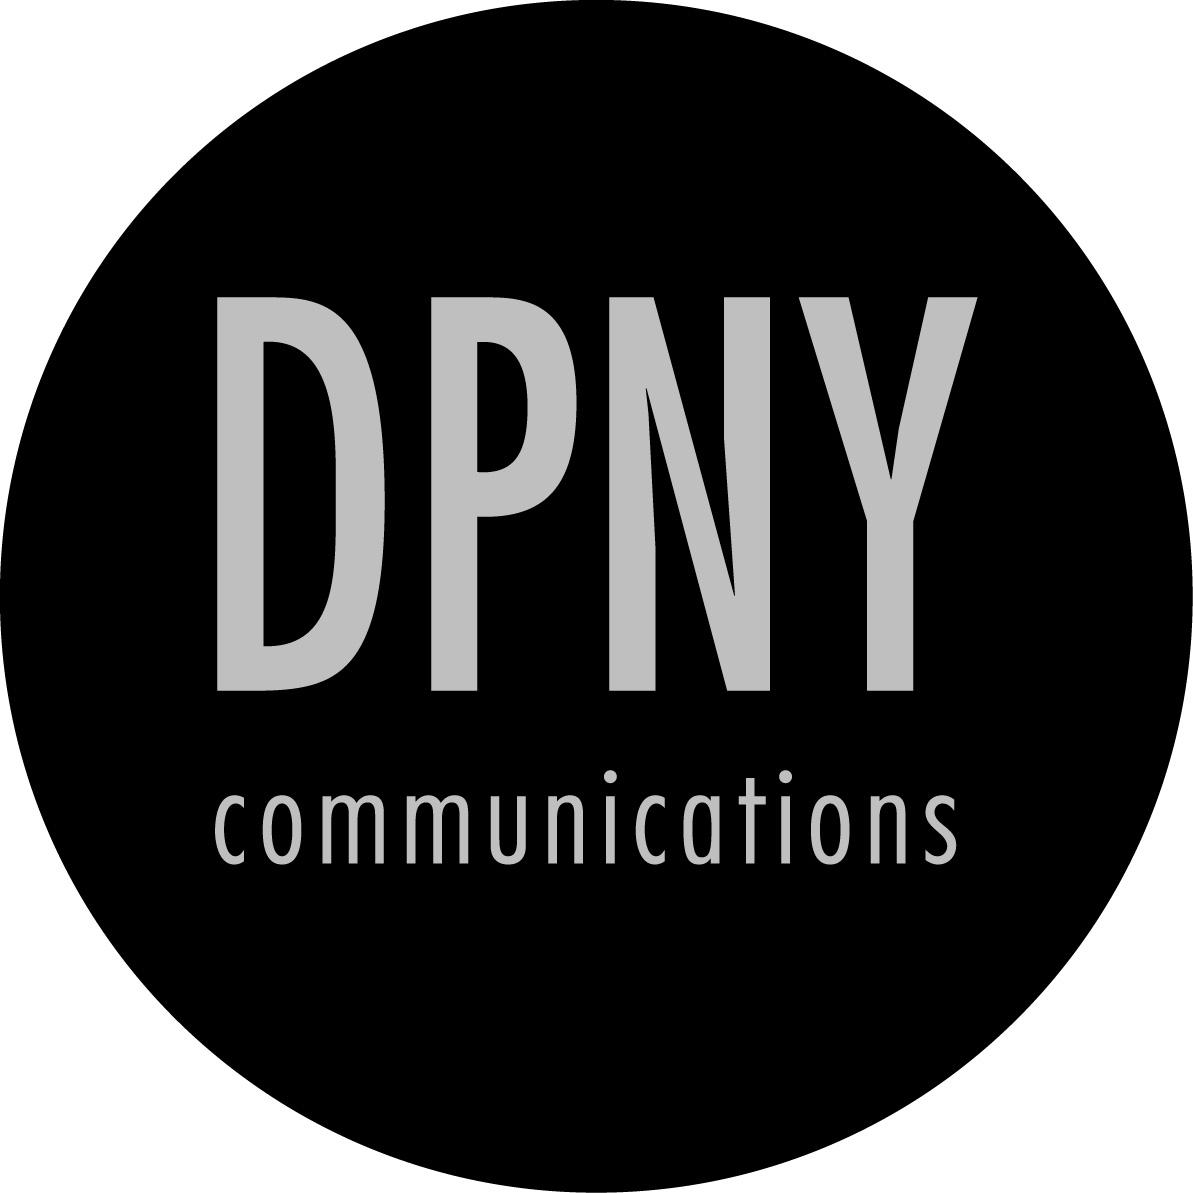 DPNY communications SLU